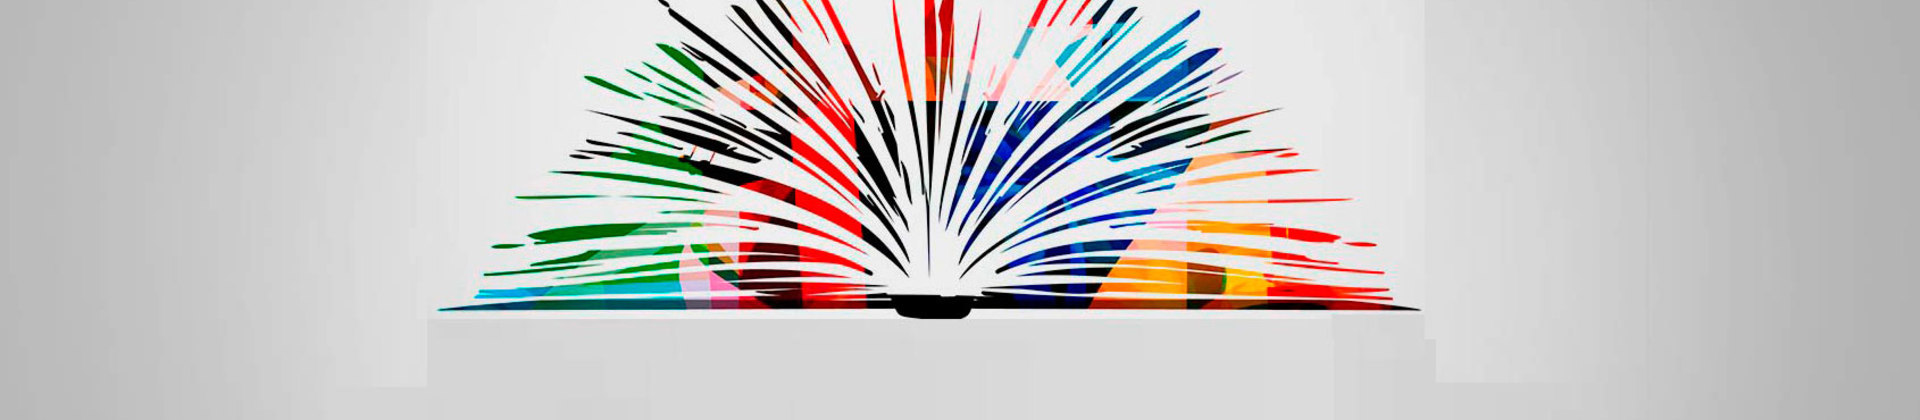 #<School:0x00559c1233e240>-Saiba o que escritores e roteiristas tem a ensinar para publicitários e marketeiros